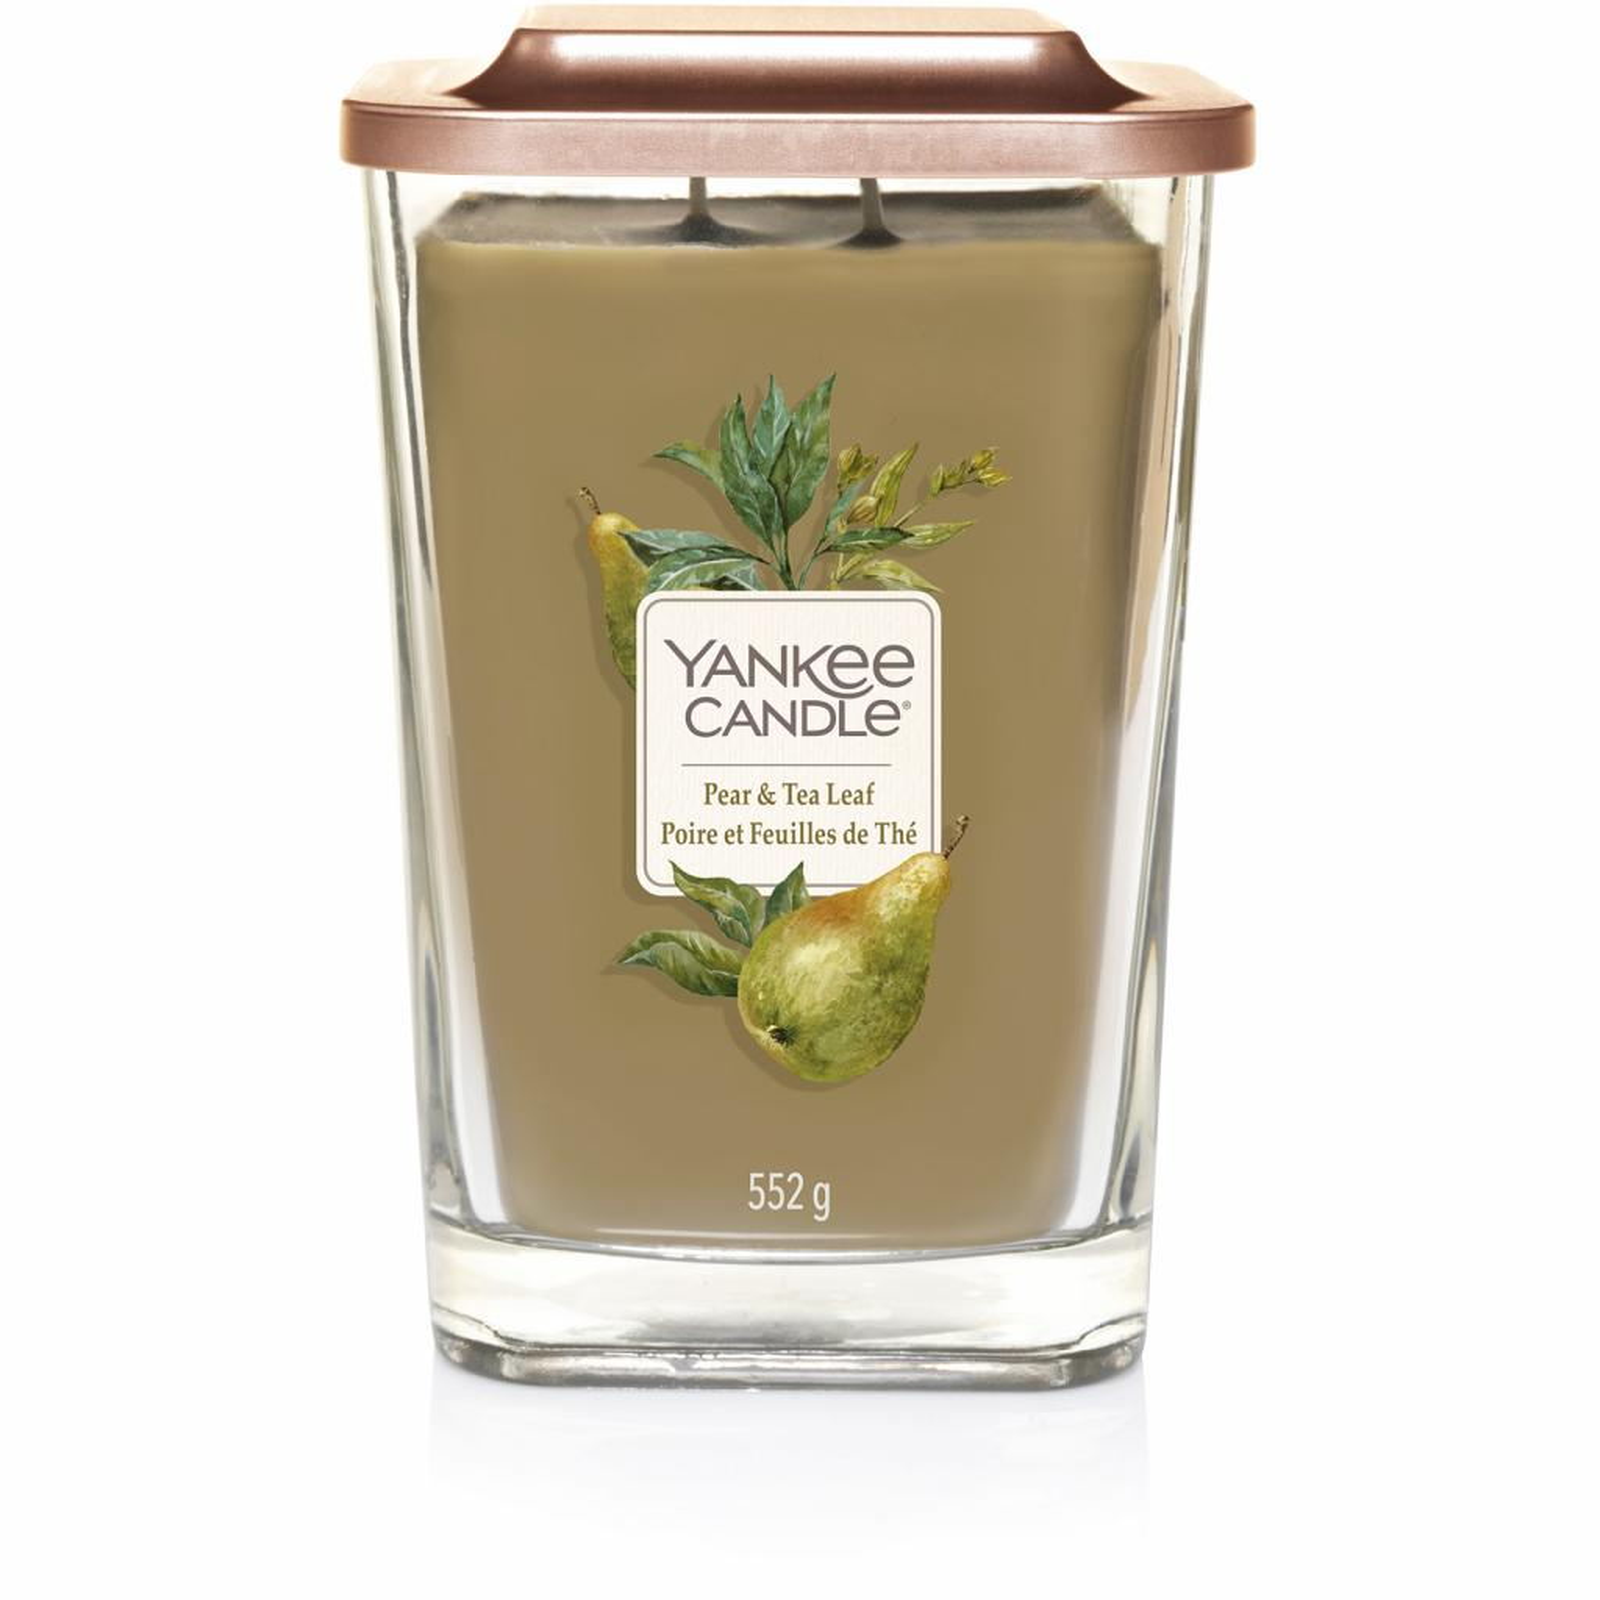 Yankee Candle Elevation-Duft Pear & Tea Leaf 552g - fixefete.de